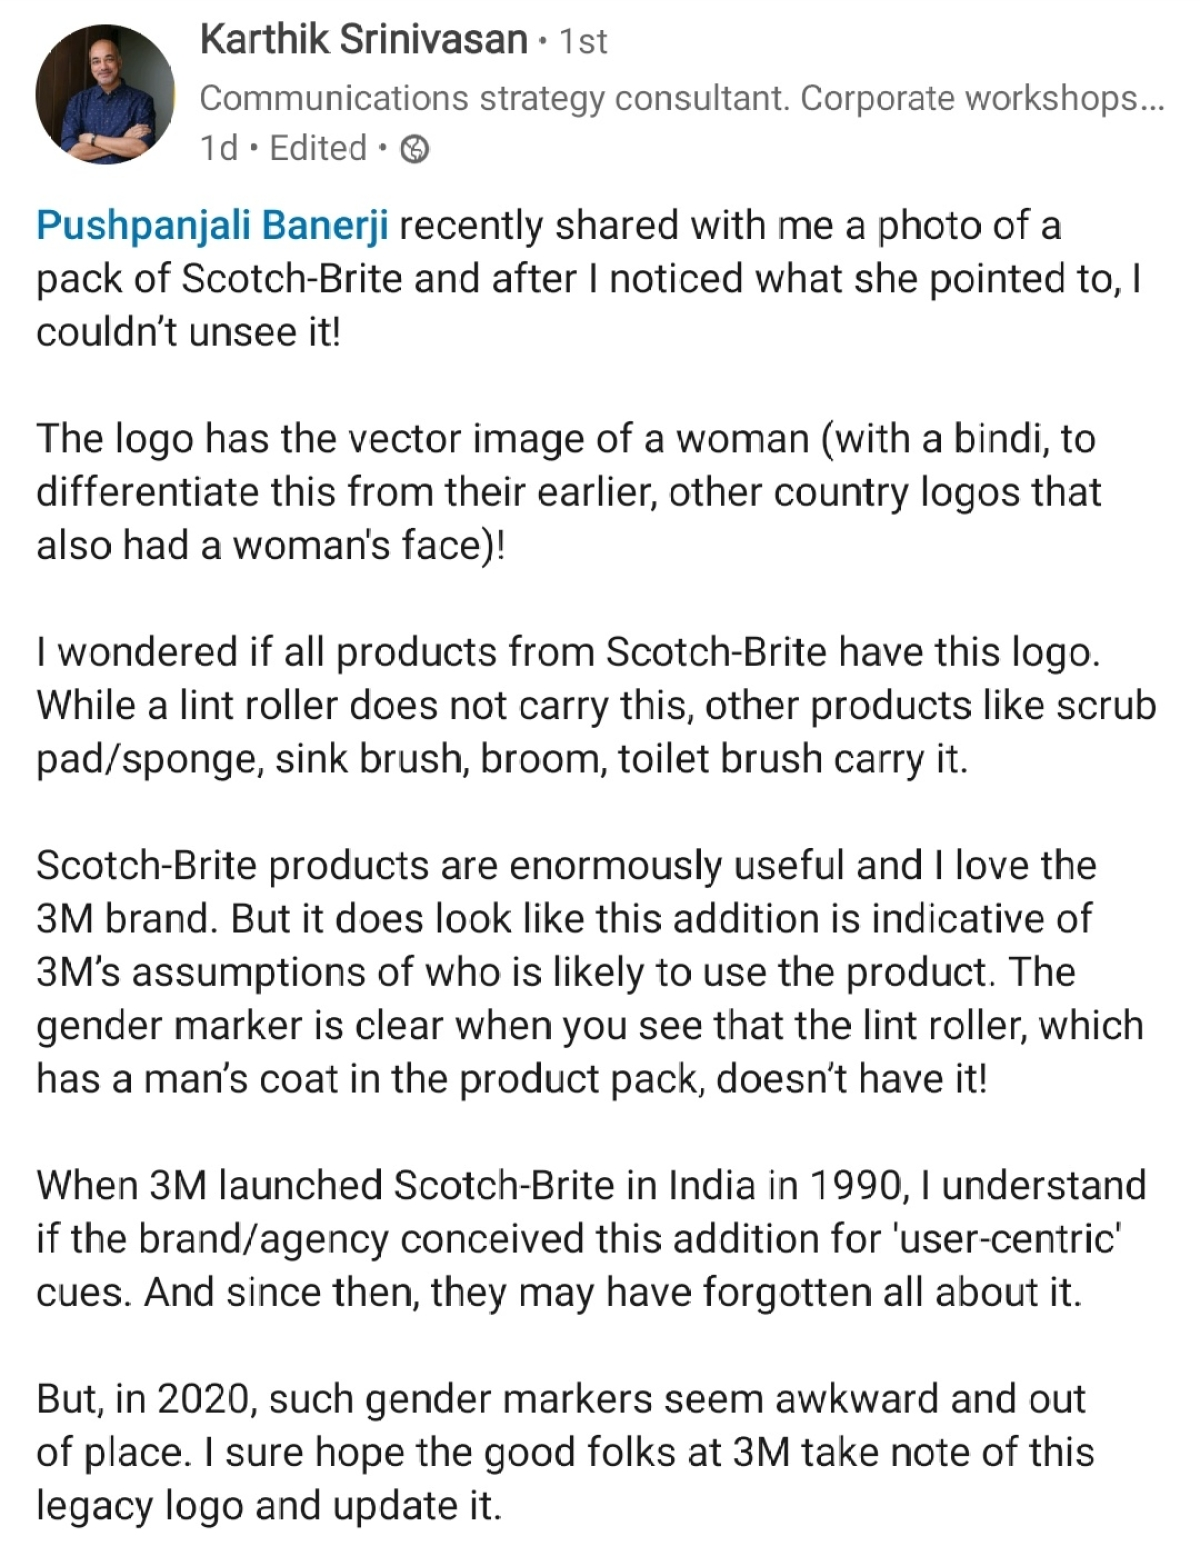 Karthik Srinivasan's post on LinkedIn